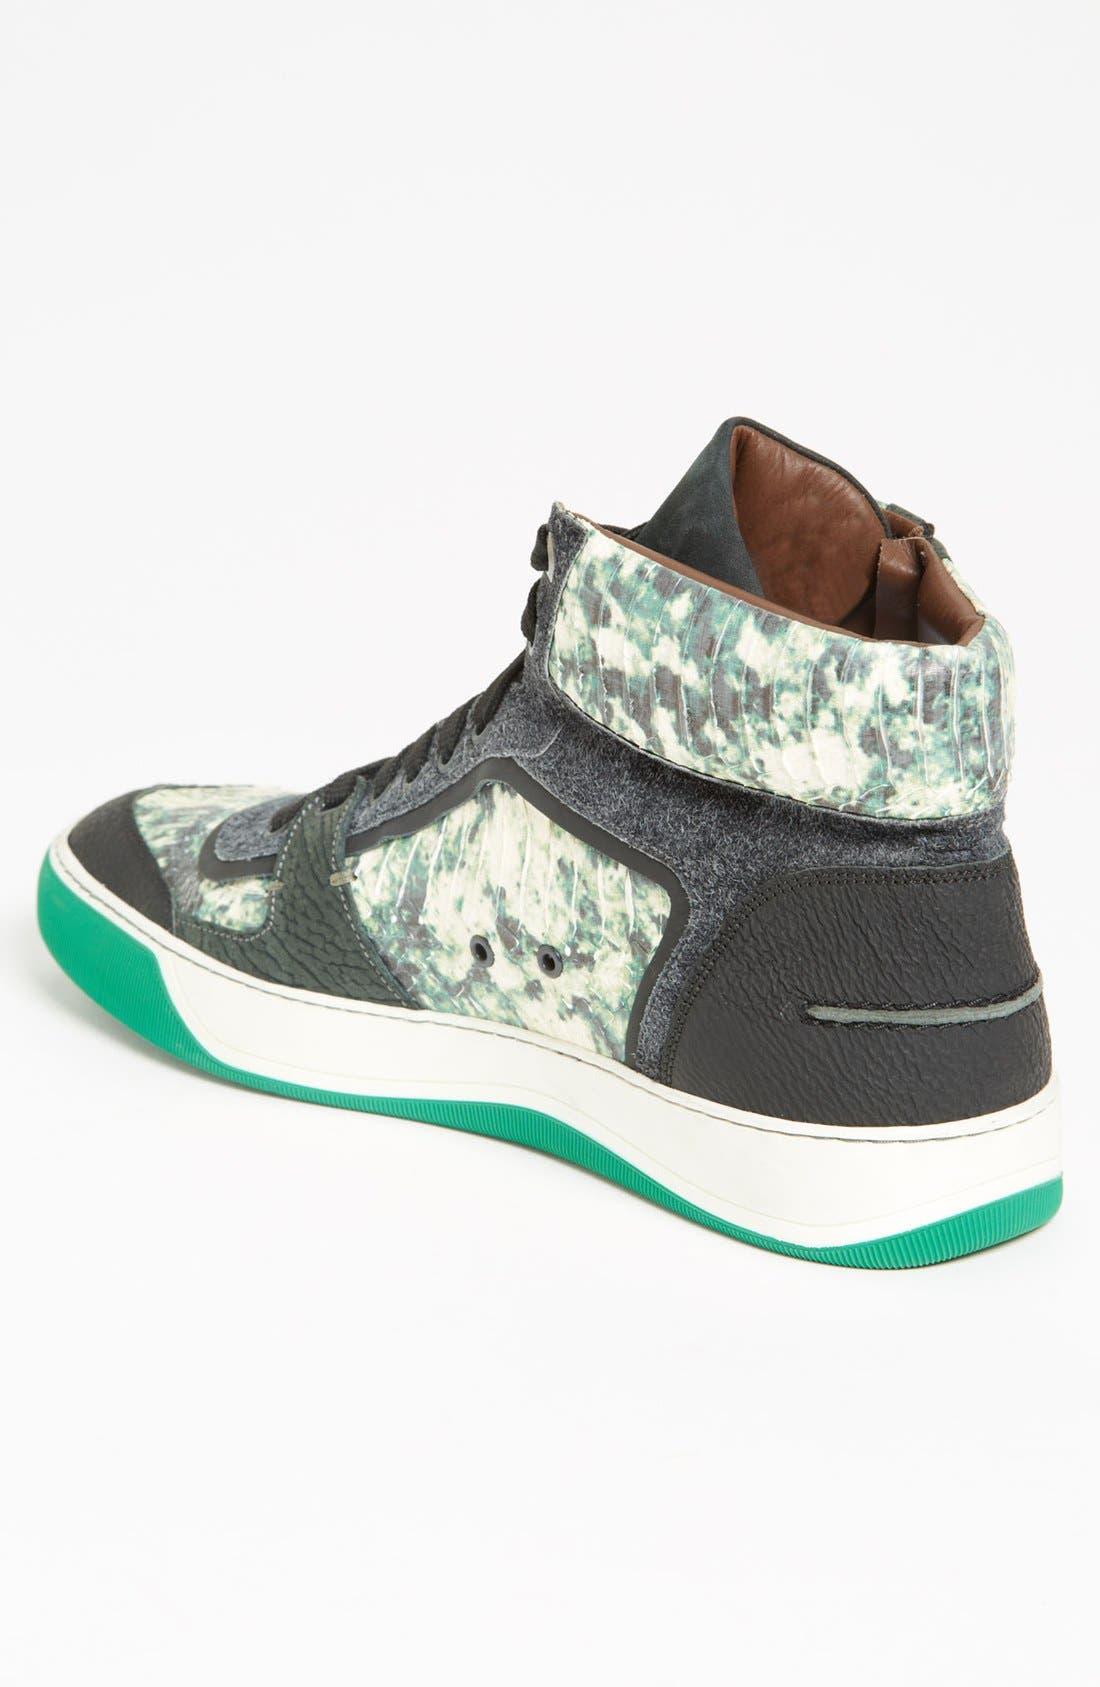 LANVIN, High Top Sneaker, Alternate thumbnail 3, color, 300